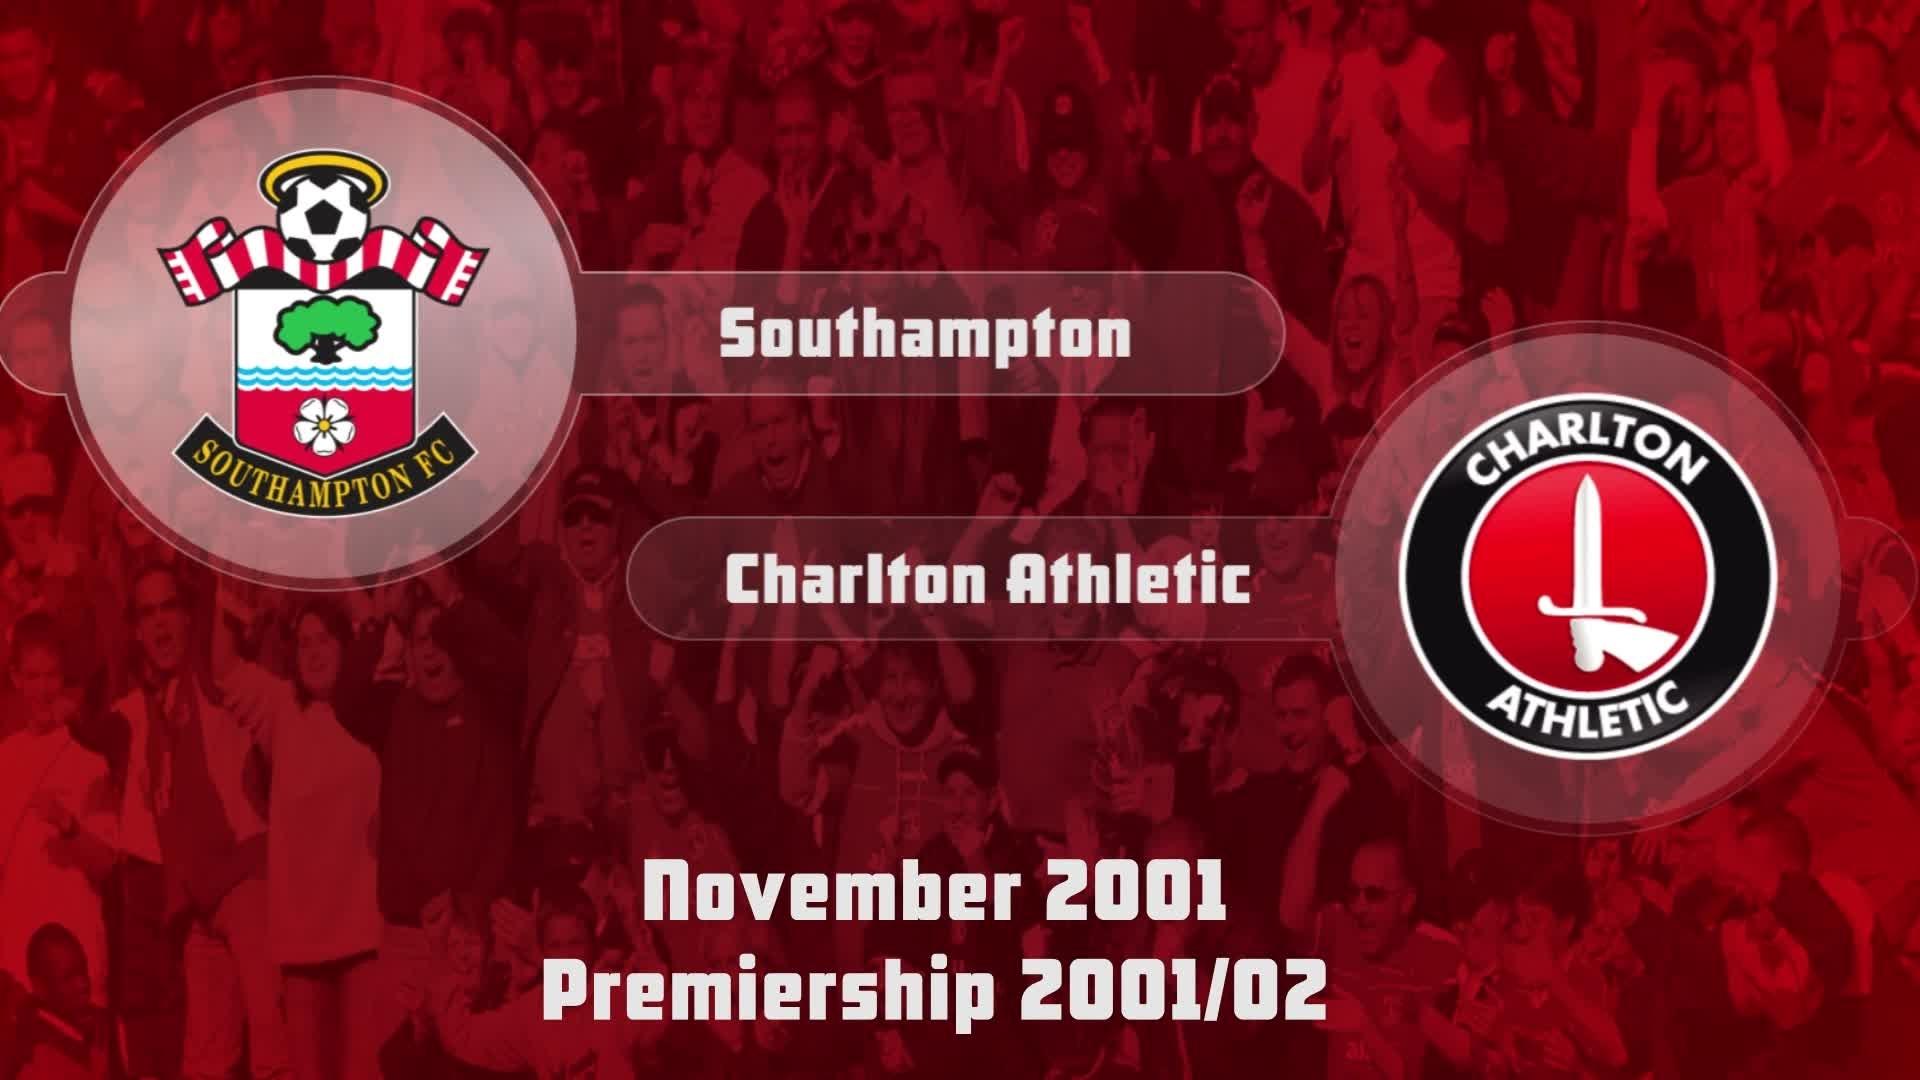 15 HIGHLIGHTS | Southampton 1 Charlton 0 (Nov 2001)